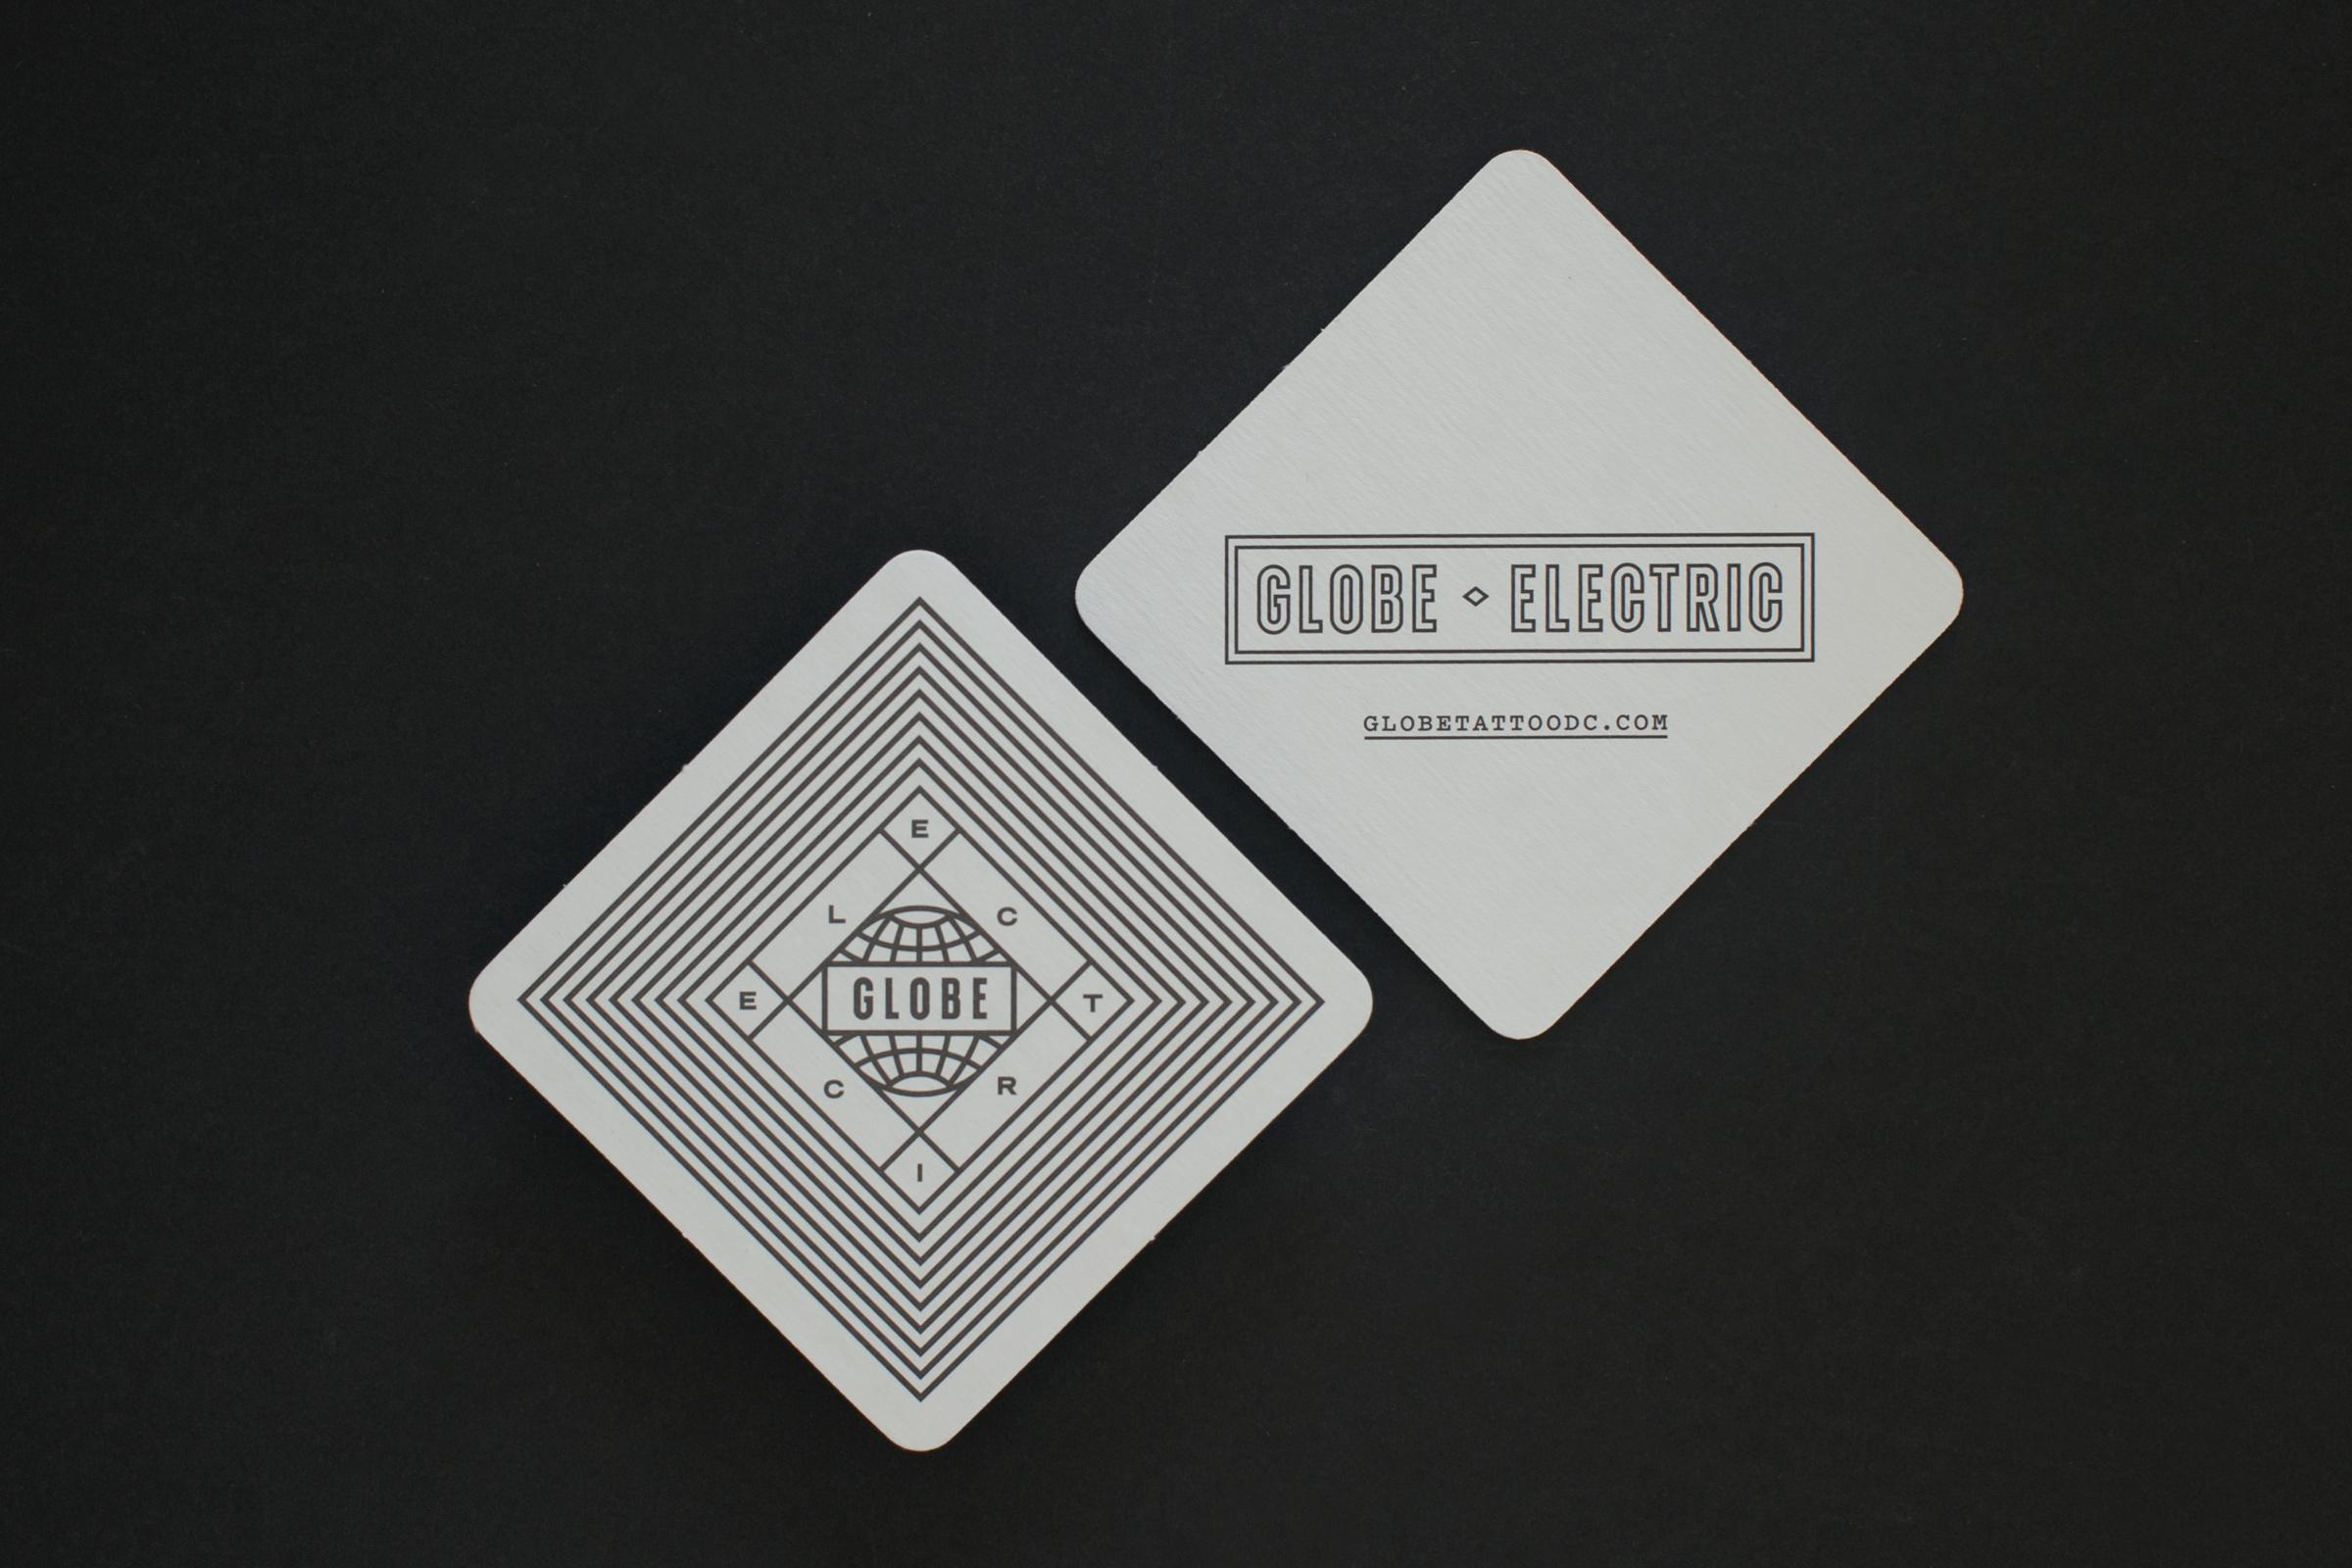 Globe_Electric_Tattoo__Branding_Design_4.jpg